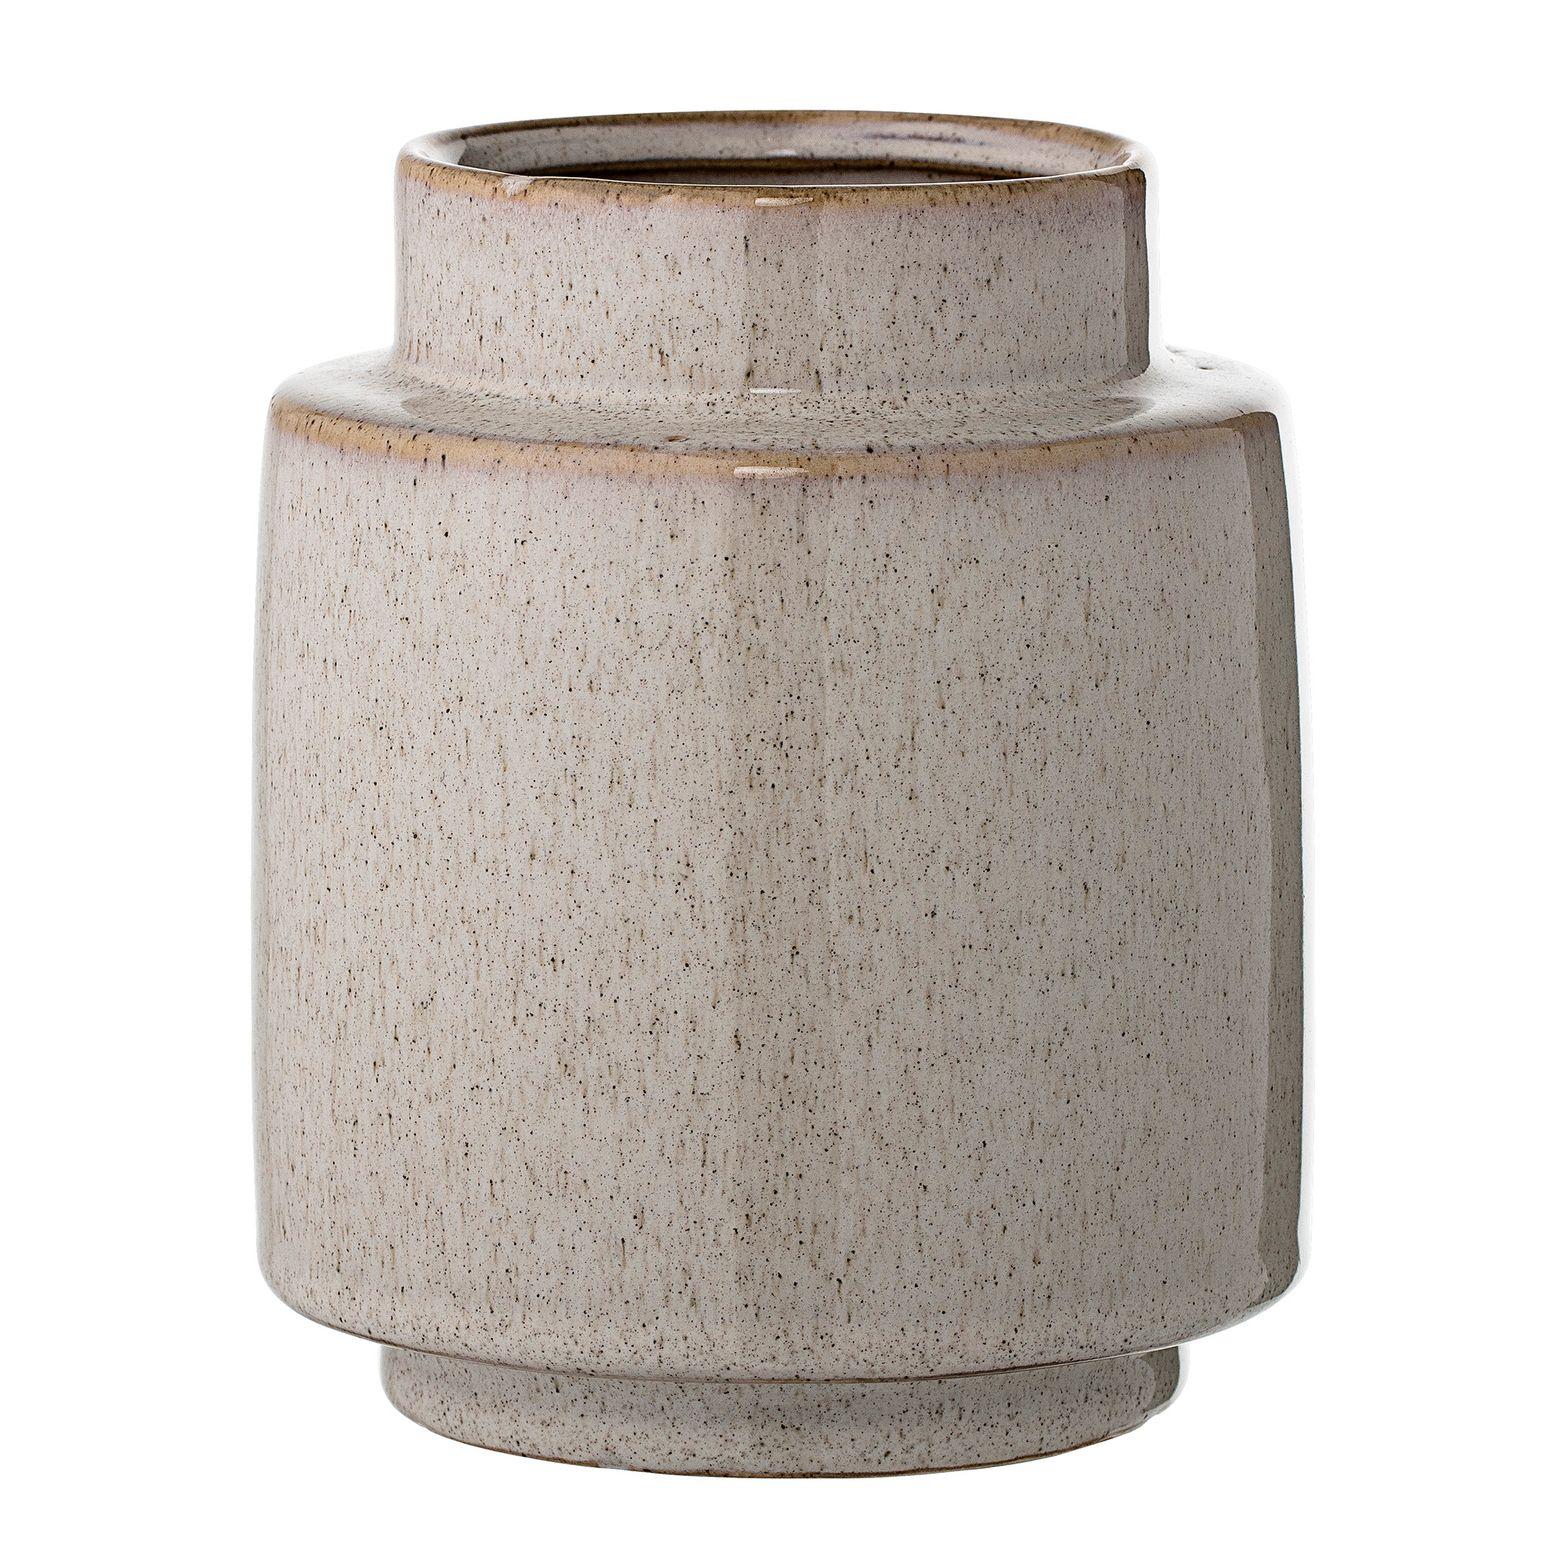 Bloomingville Vase Stoneware   nature online kaufen   STUFF Shop